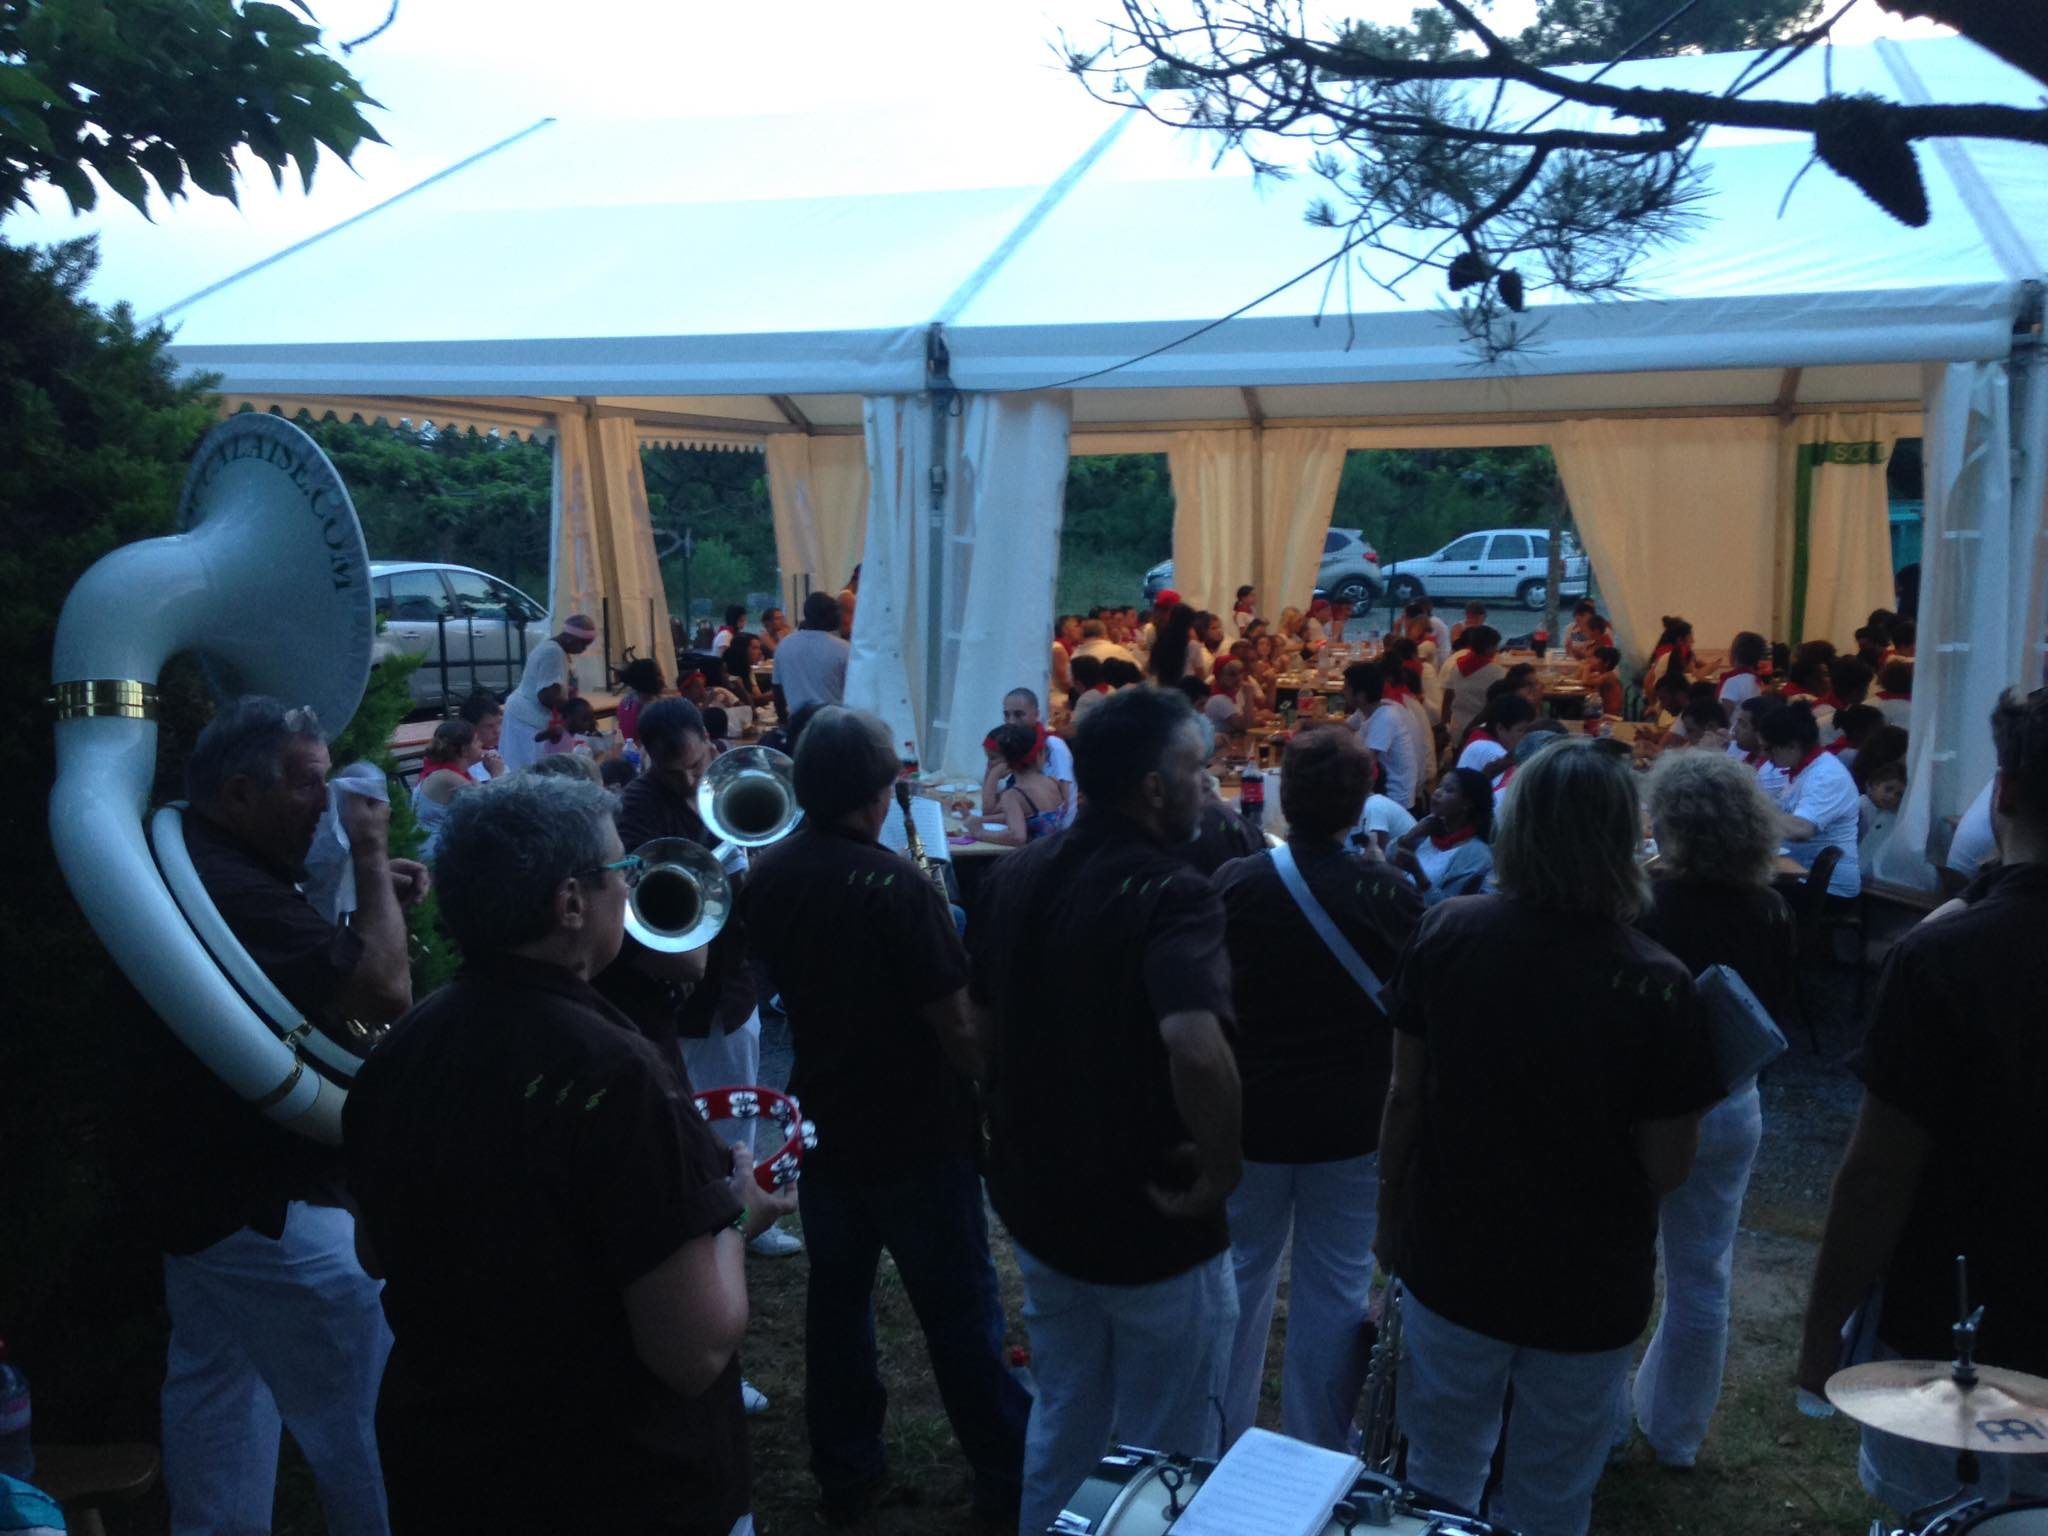 touristra tarnos animation repas fanfare la-boucalaise musique harmonie bandas